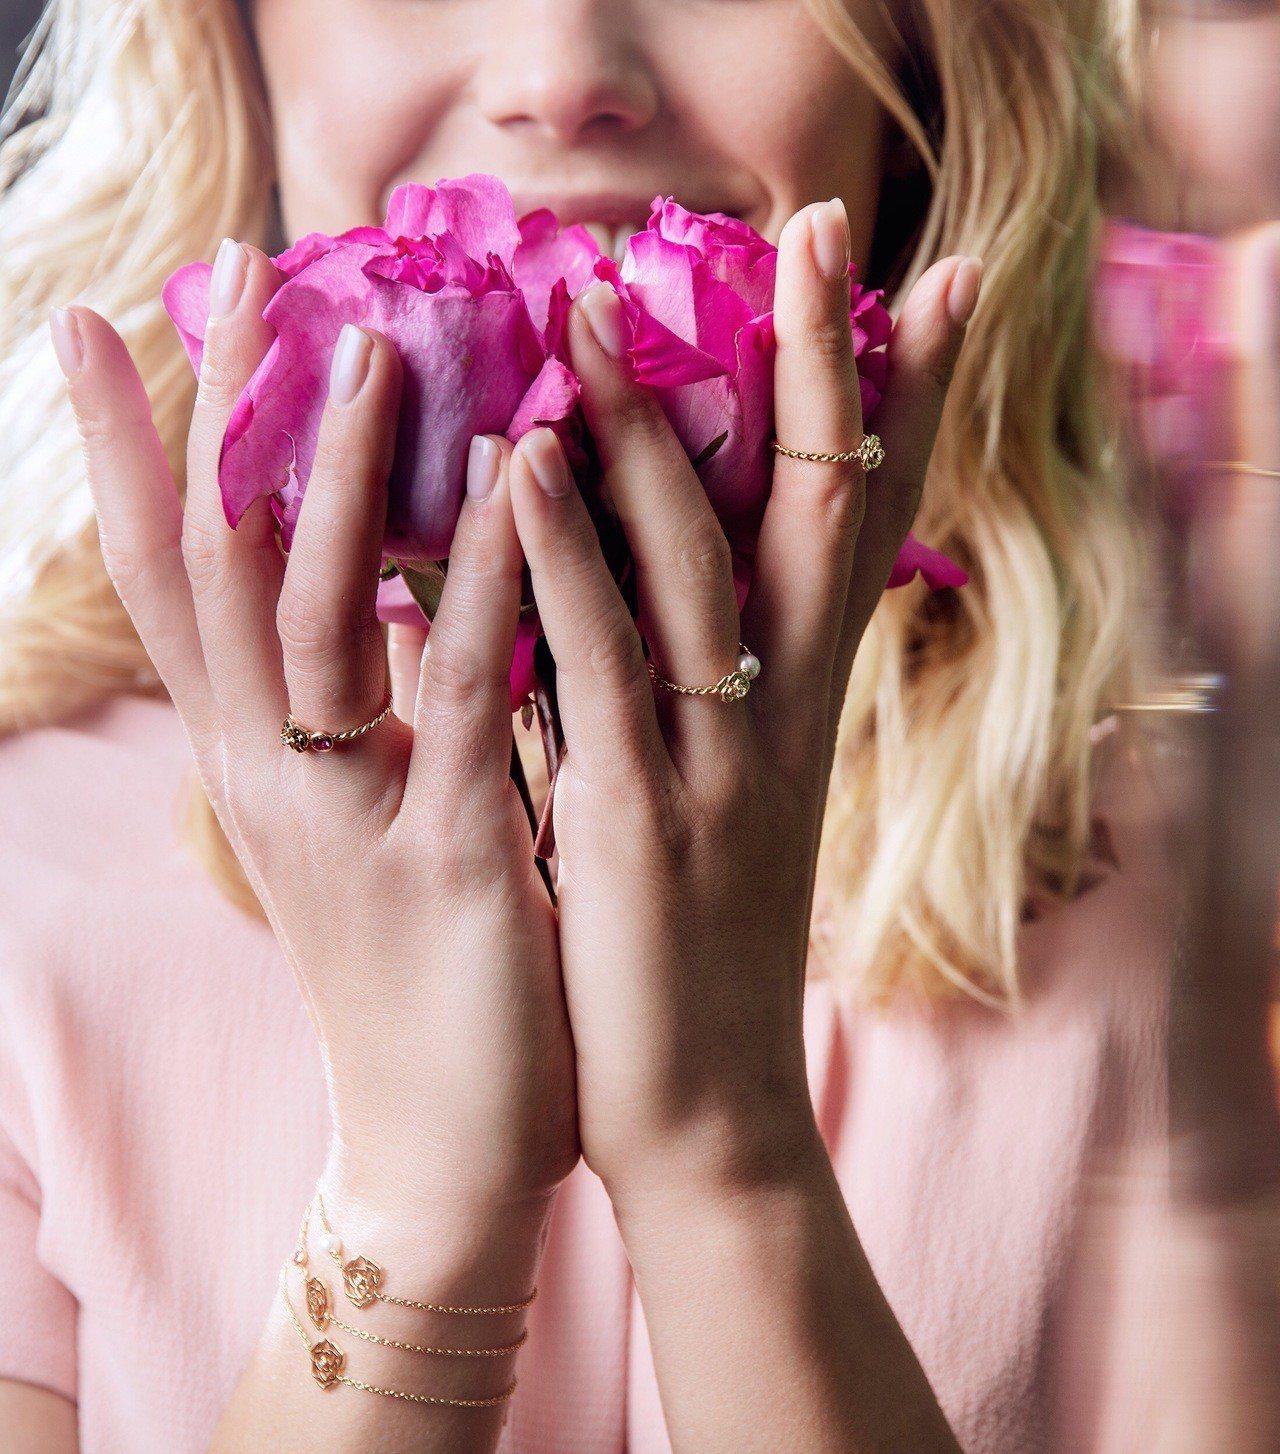 Piaget Rose系列推出新一代的設計,融入高級珠寶的創作元素。圖/伯爵提供